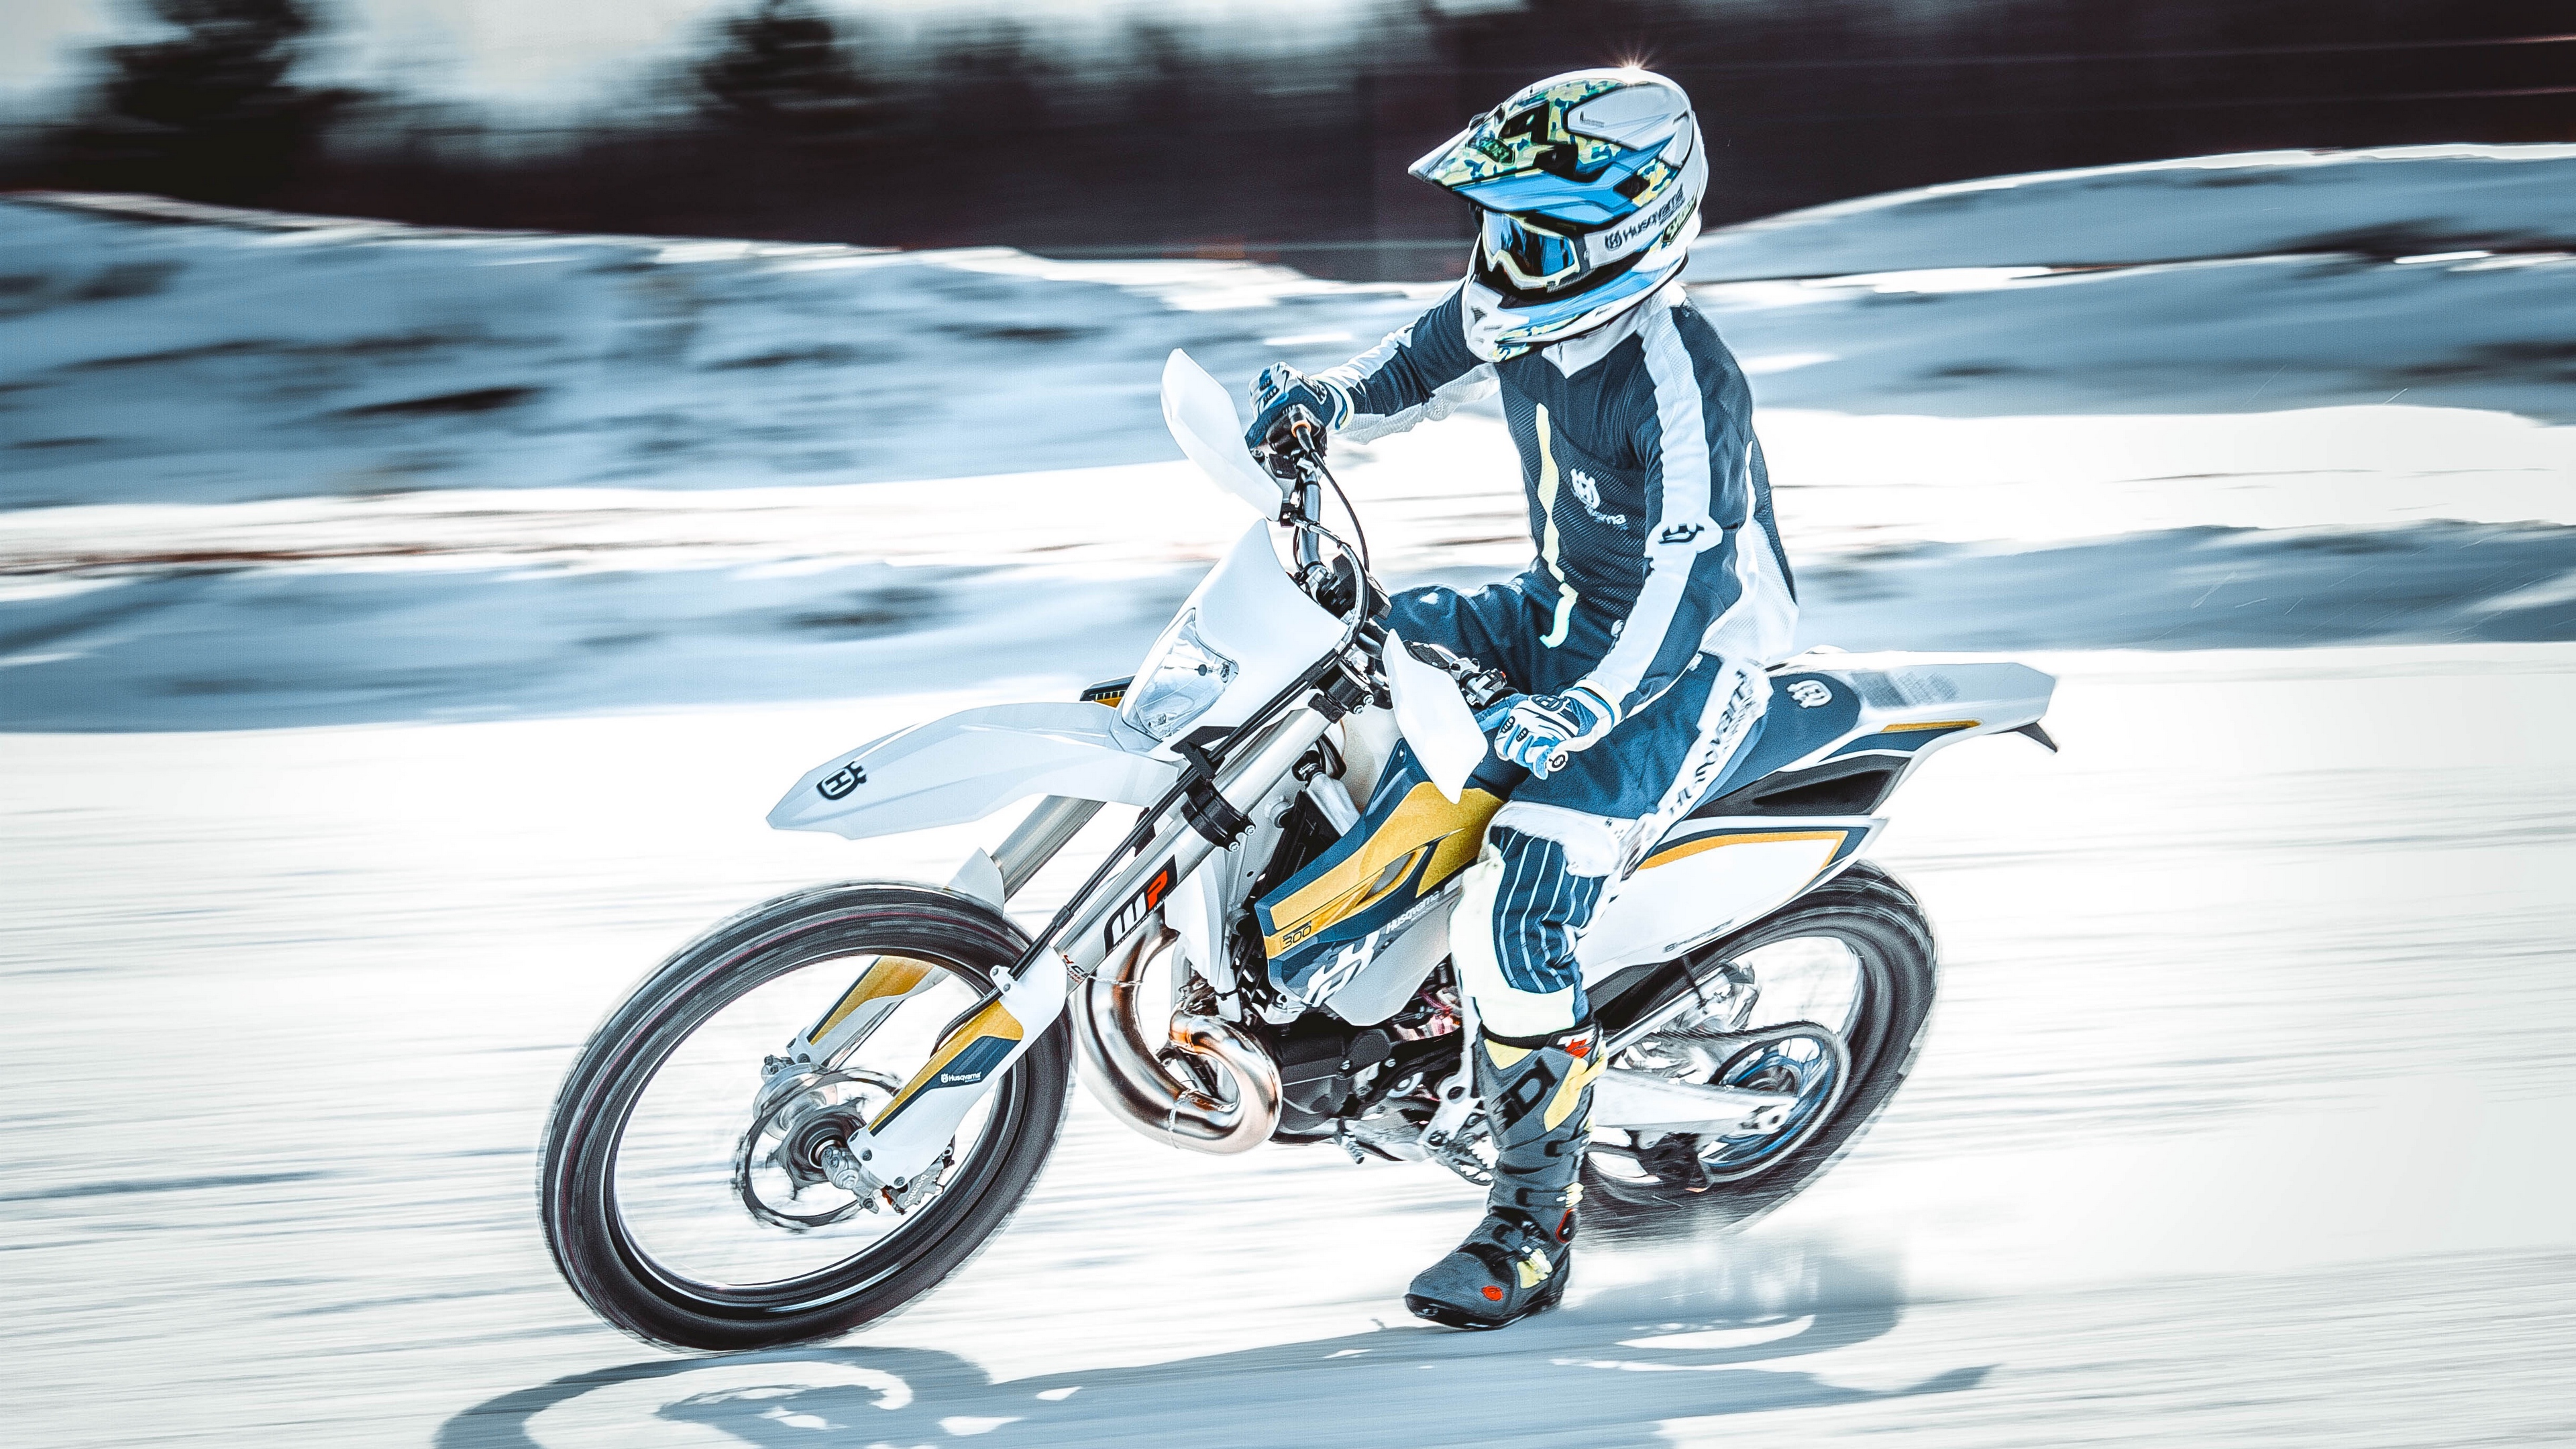 motorcyclist speed snow 4k 1536018377 - motorcyclist, speed, snow 4k - speed, Snow, motorcyclist